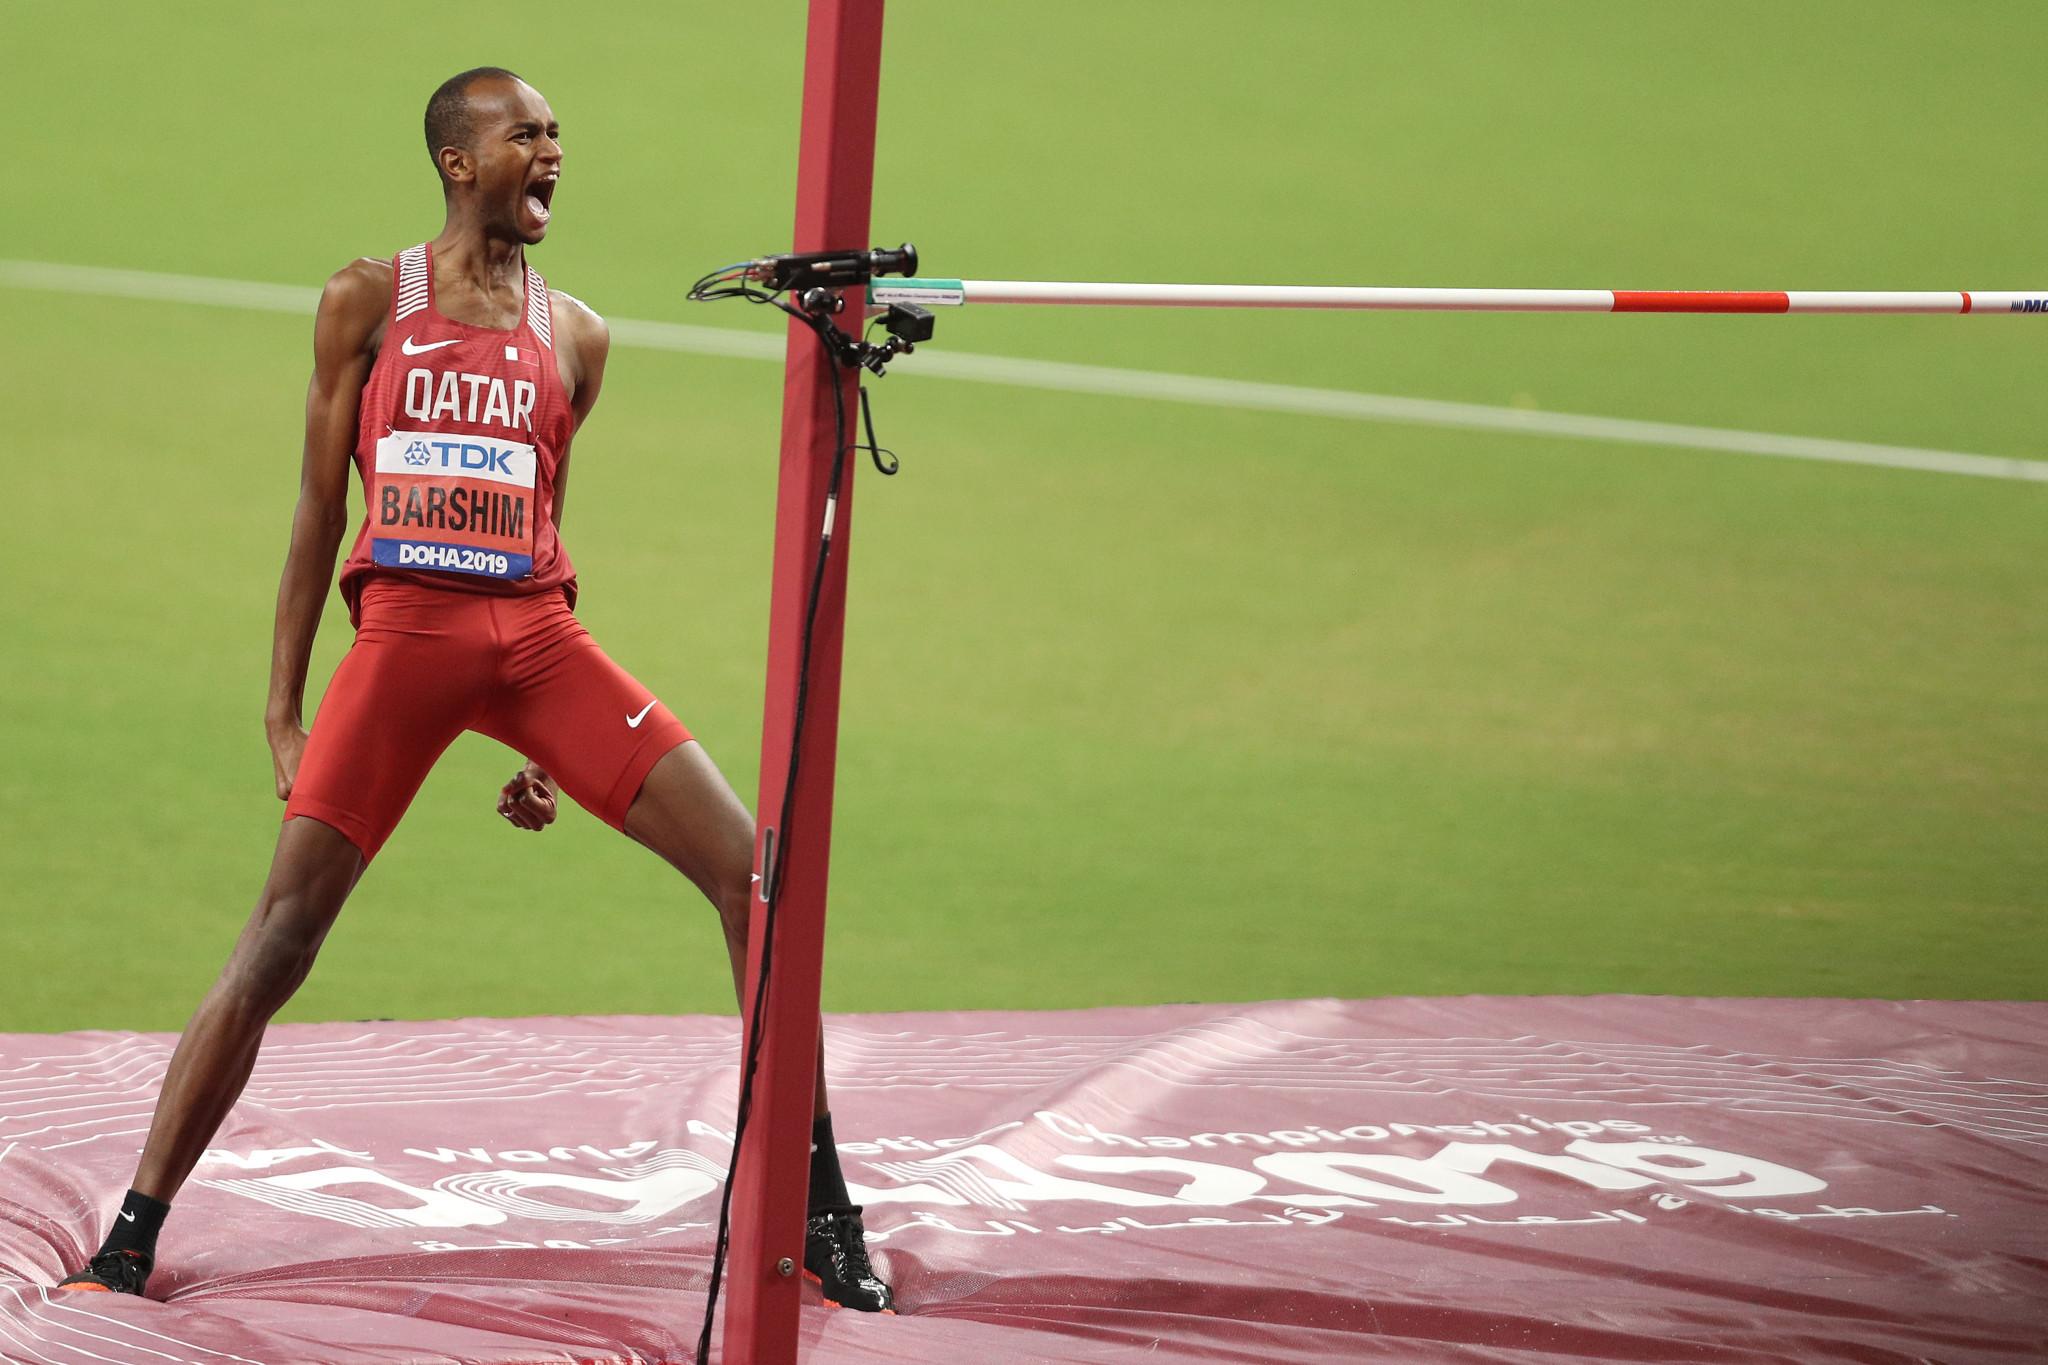 Two-time high jump world champion Barshim among athletes to back Doha 2030 Asian Games bid